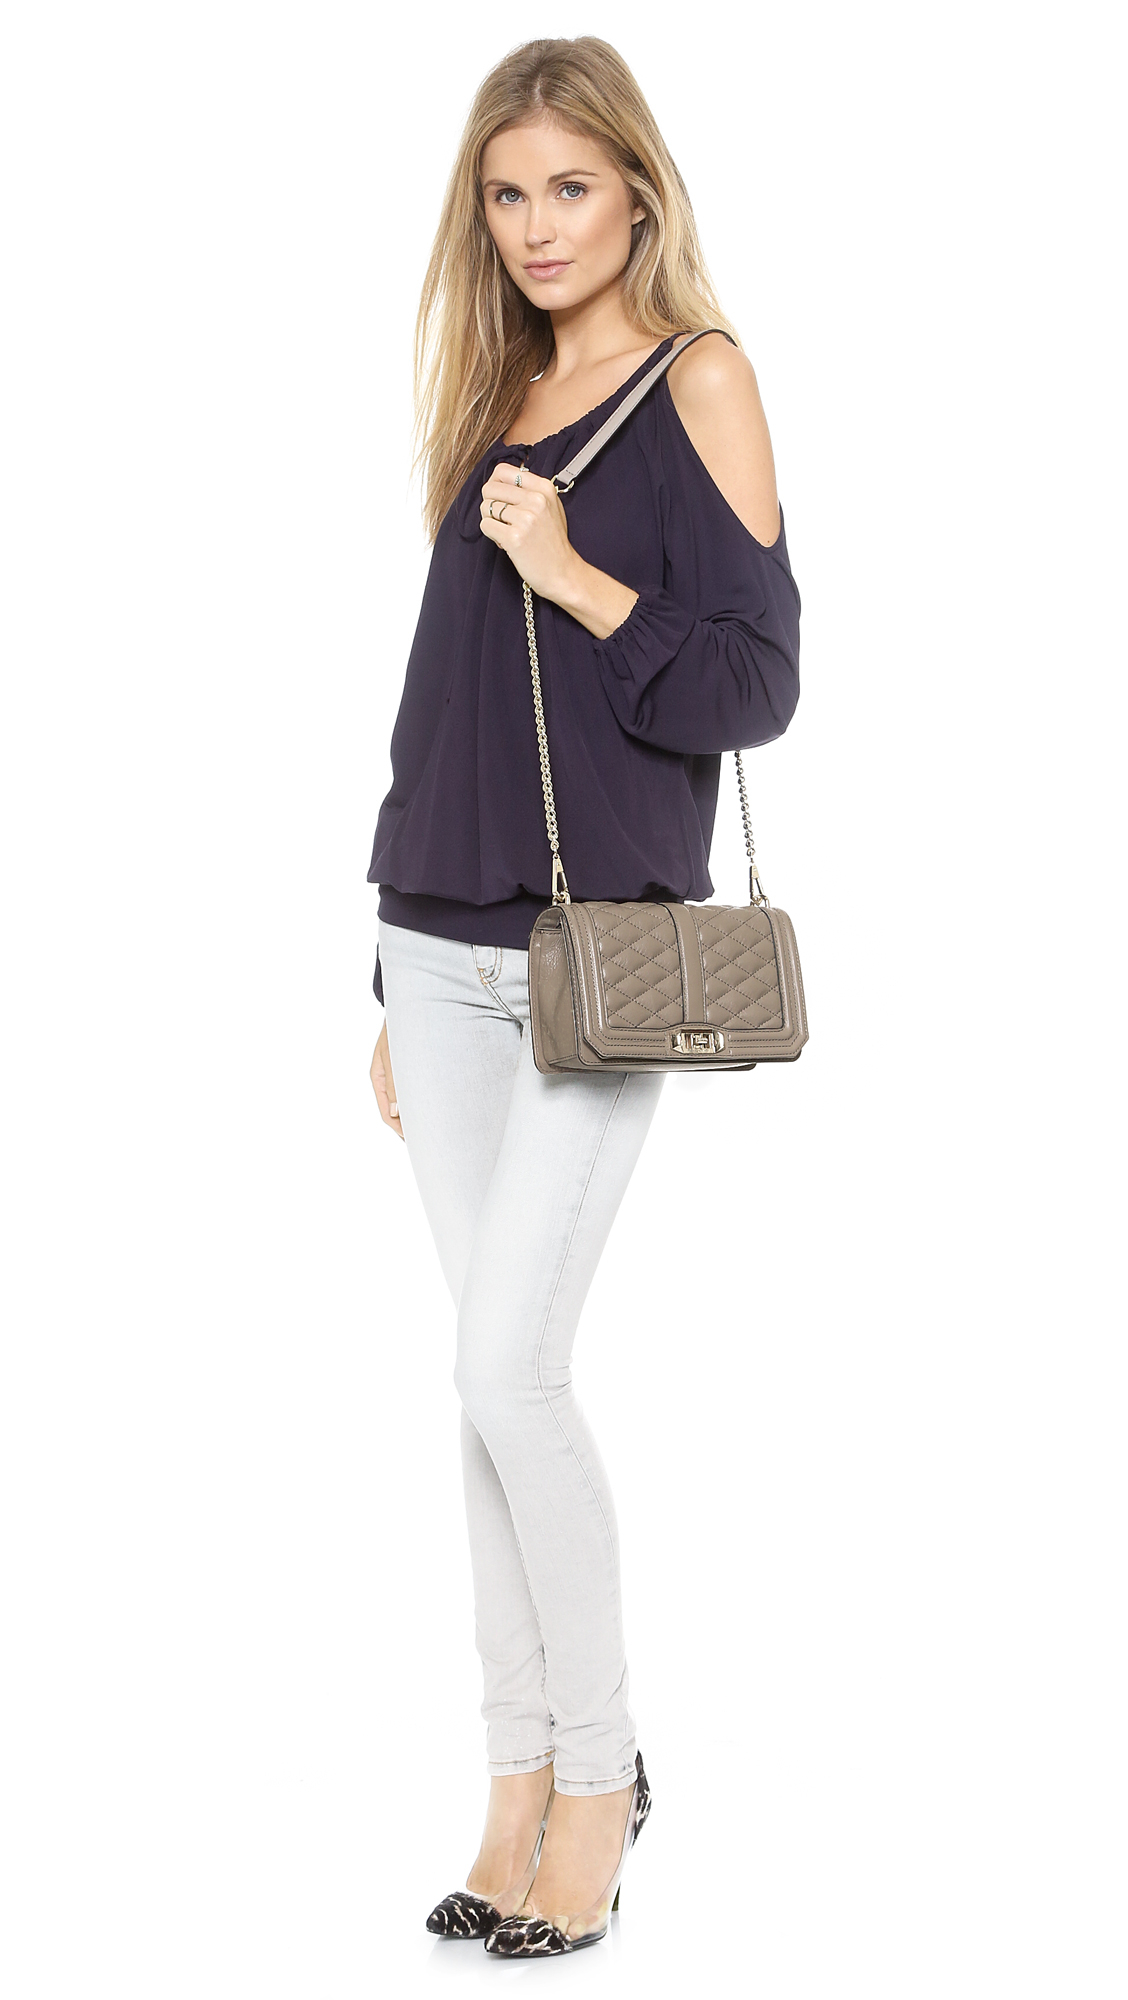 Rebecca Minkoff Love Cross Body Bag - Taupe in Natural